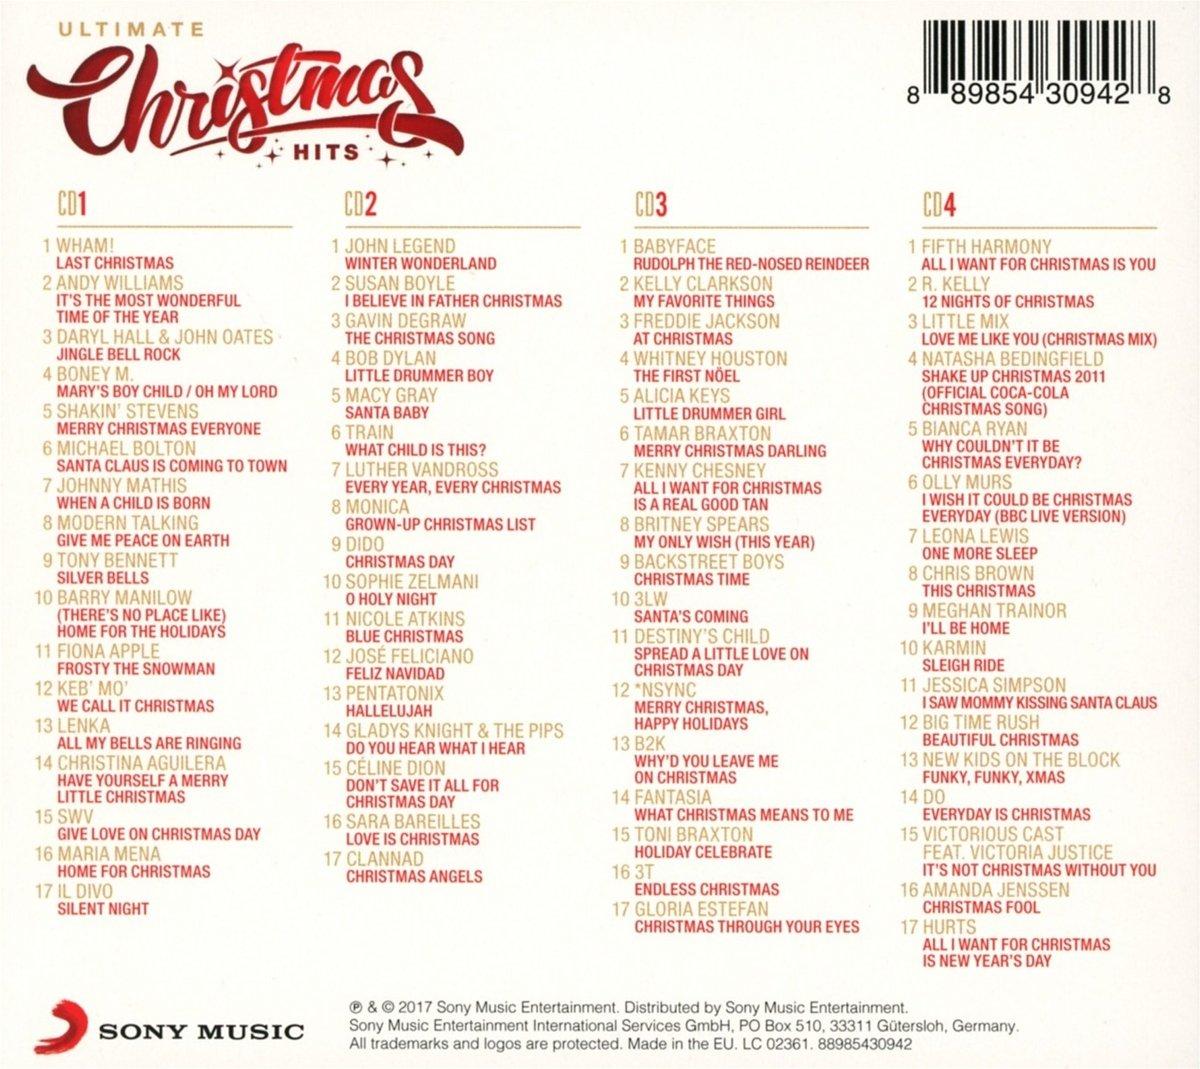 VARIOUS ARTISTS - Ultimate Christmas Hits / Various - Amazon.com Music